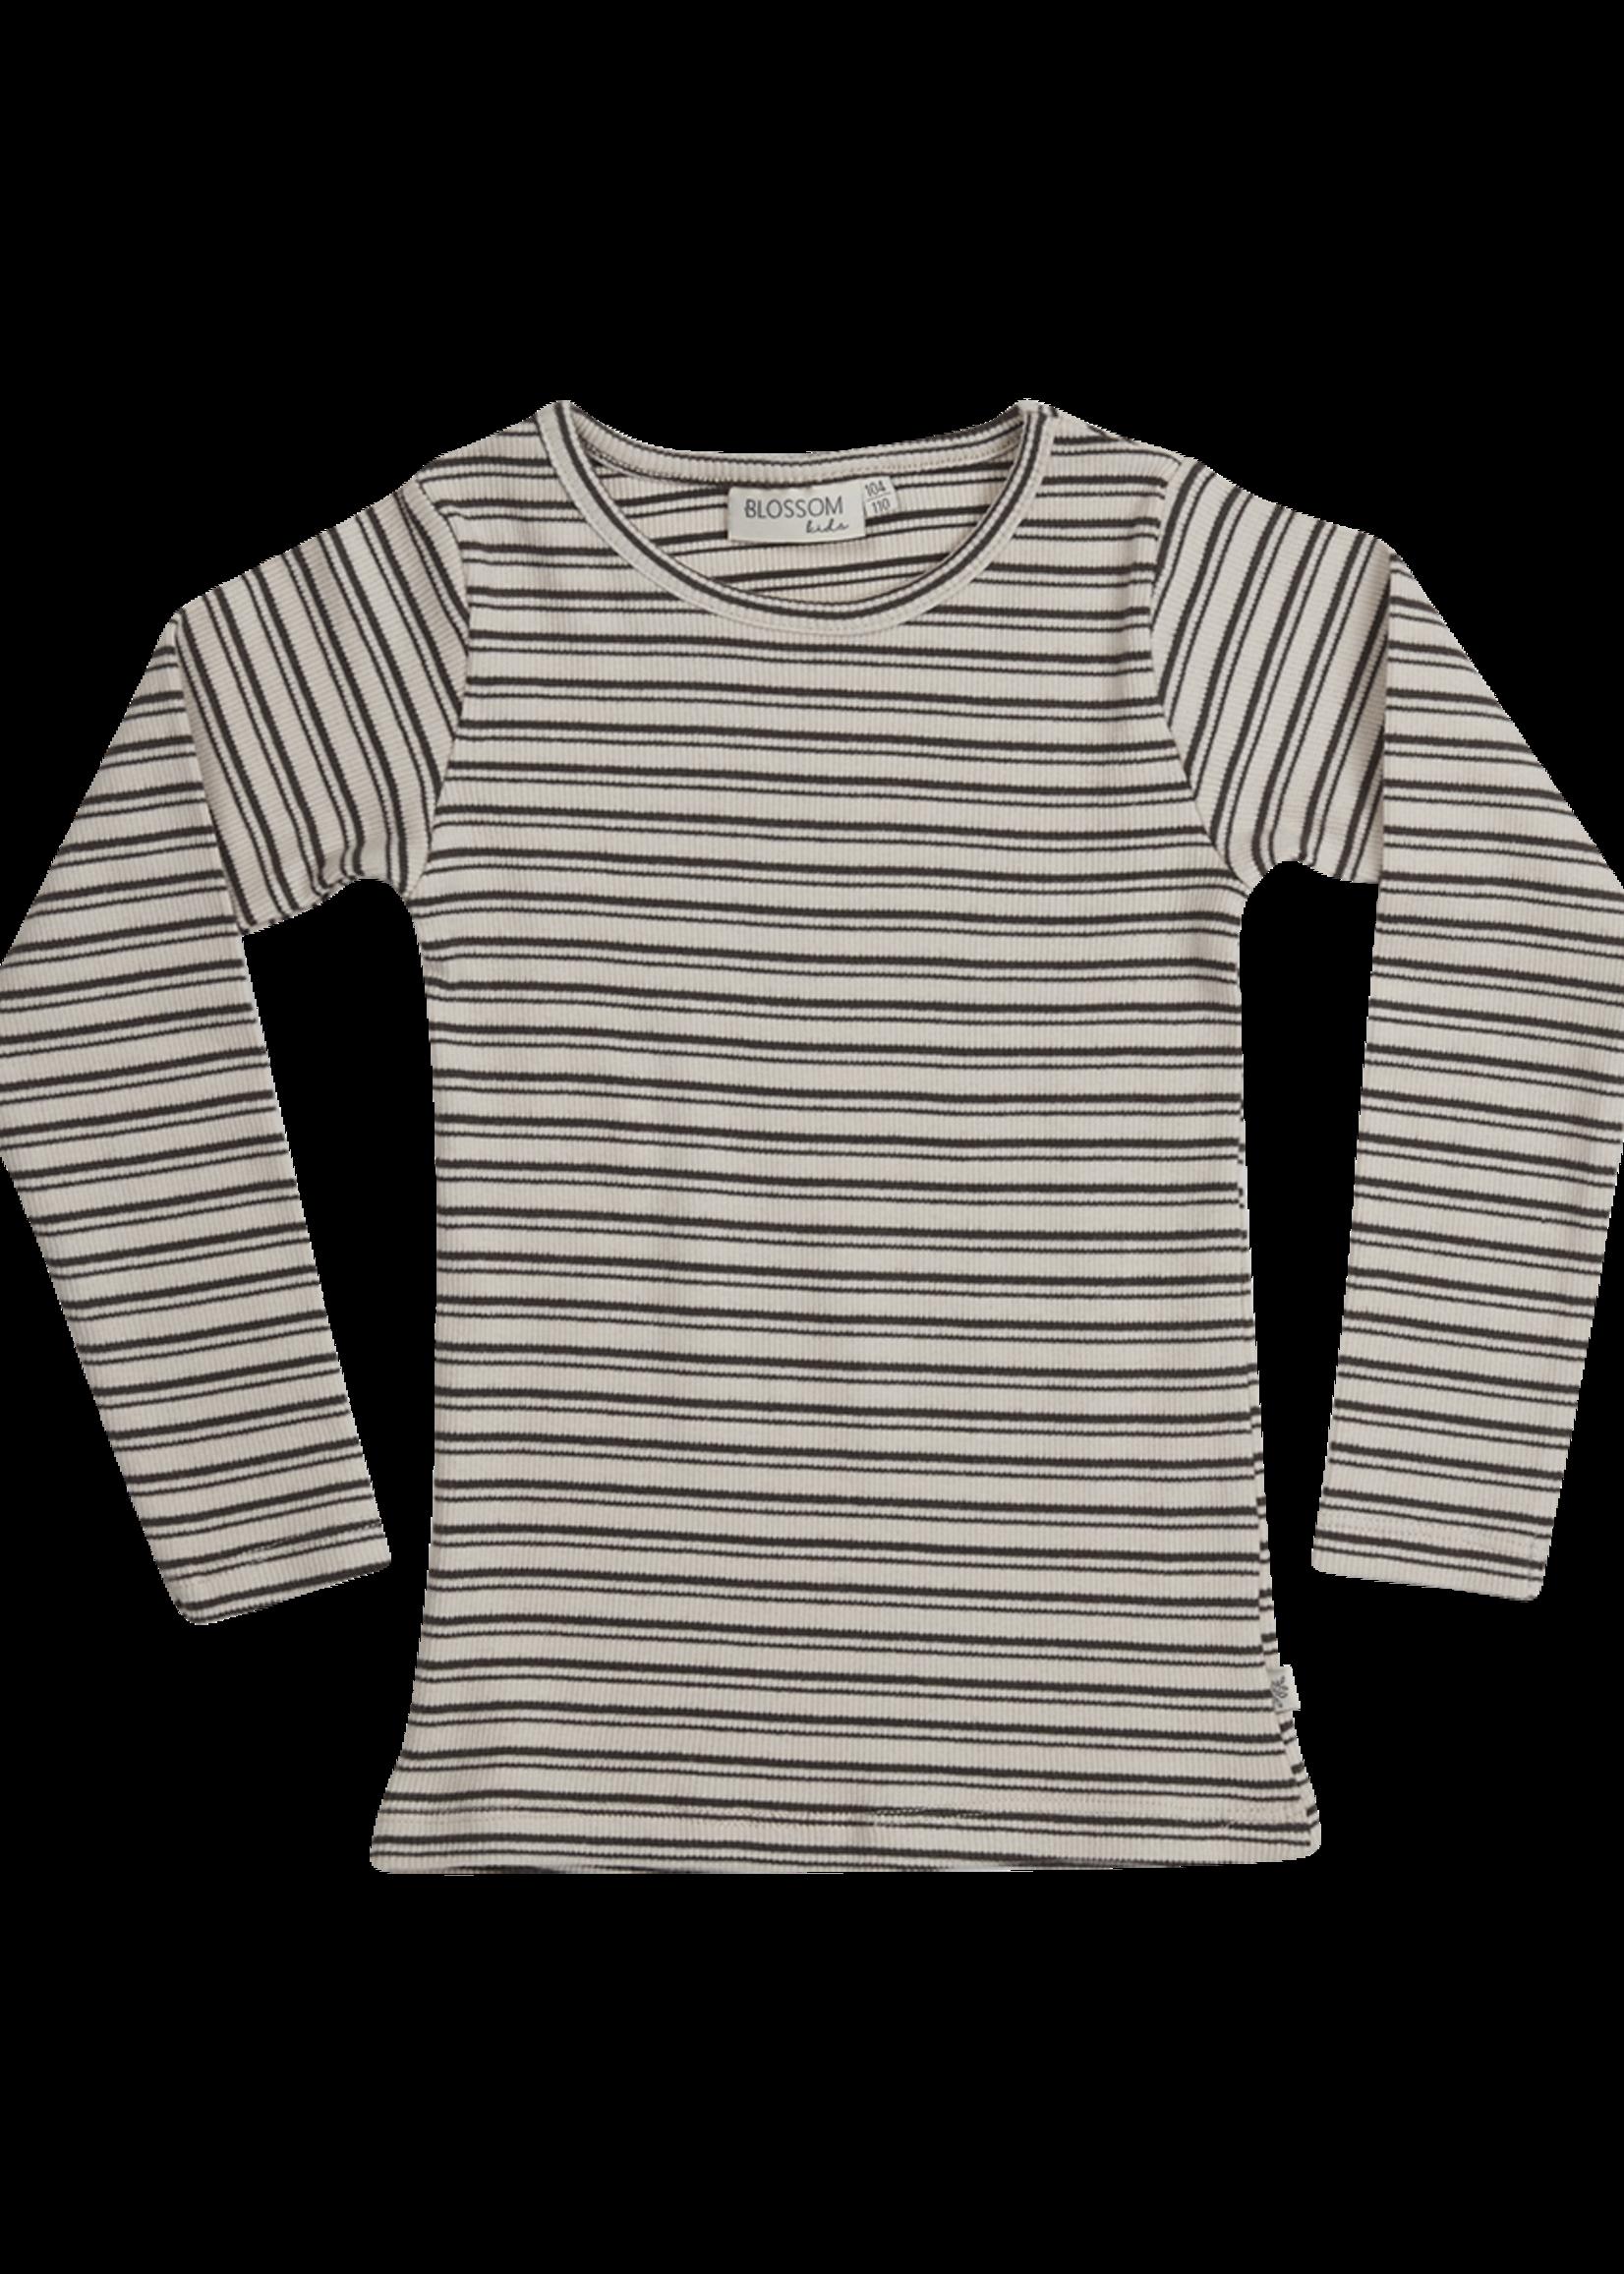 Blossom Kids Long sleeve - Stripes - Cinnamon